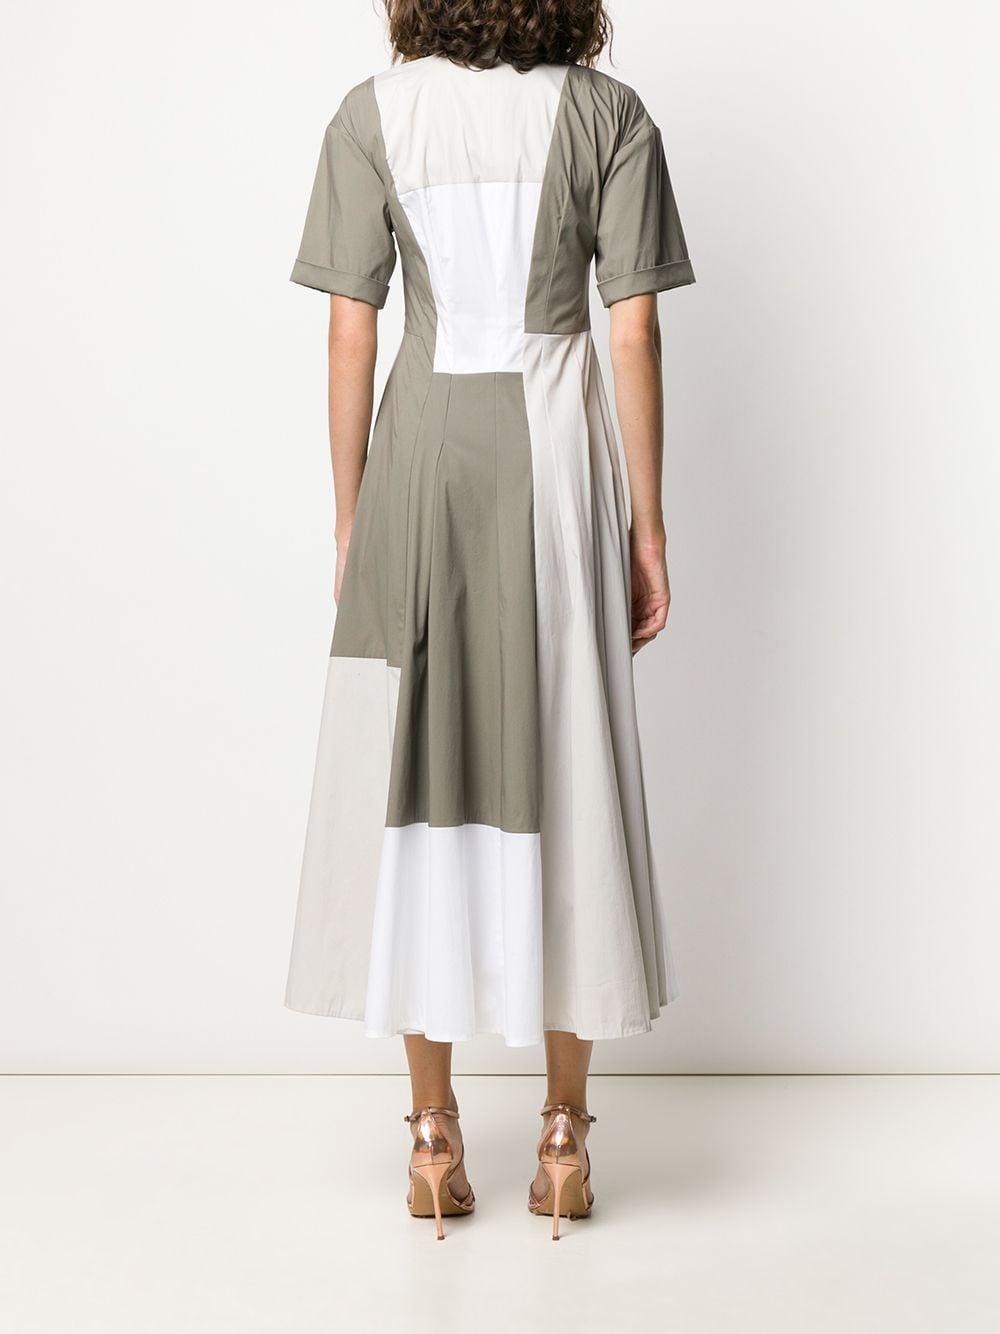 Vestido Bourgeois con diseño colour block Talbot Runhof de Algodón de color Blanco